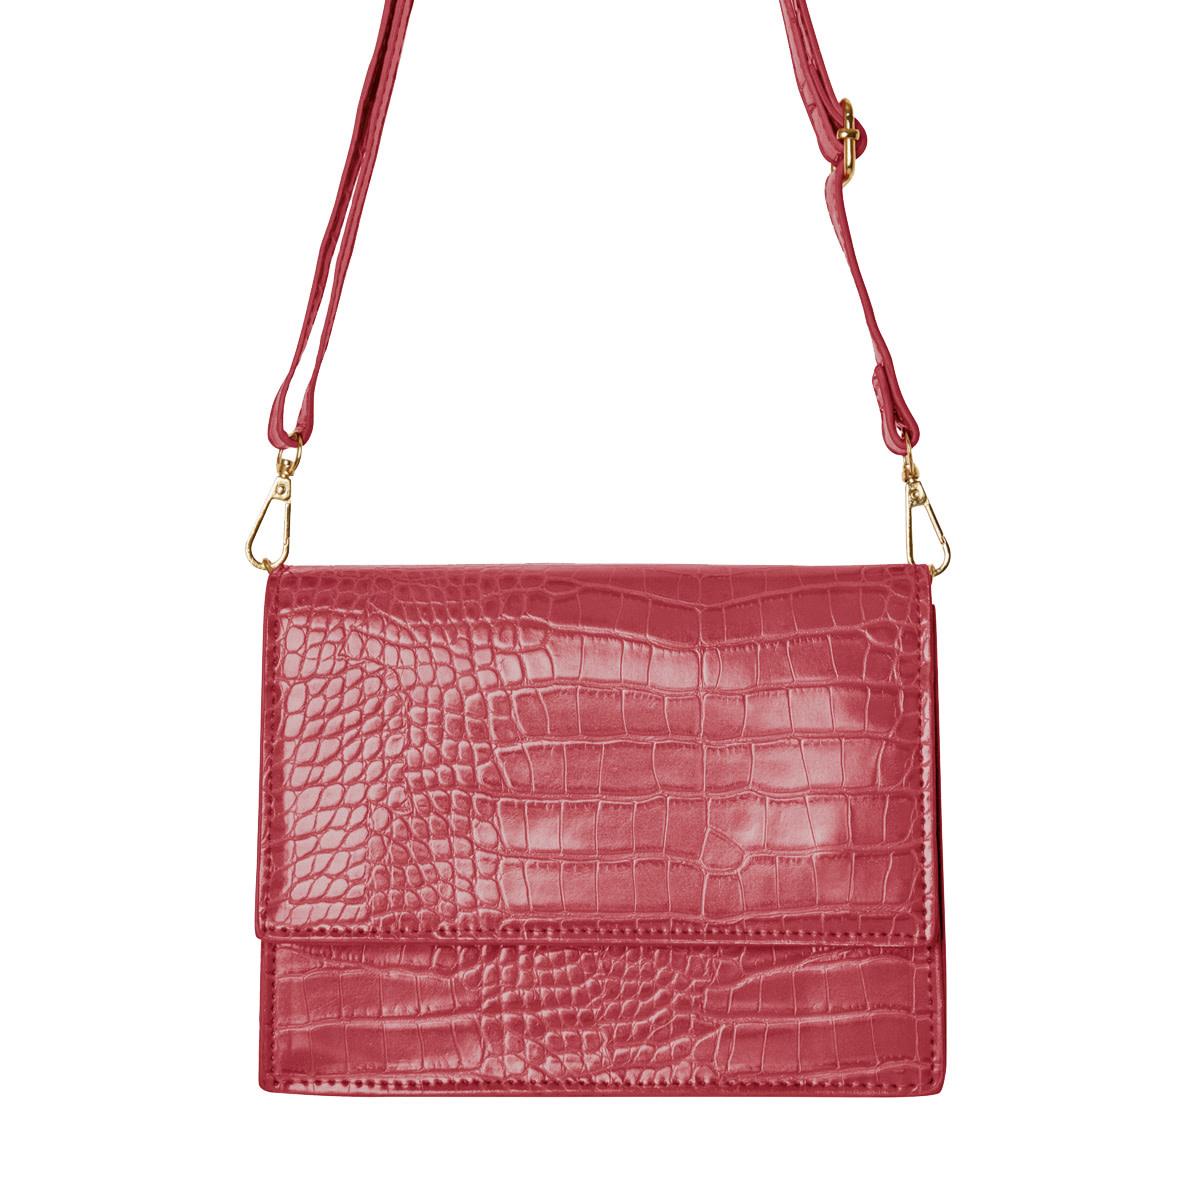 With love Bag Uptown girl - burgundy 21cm x 13.50cm x 7cm